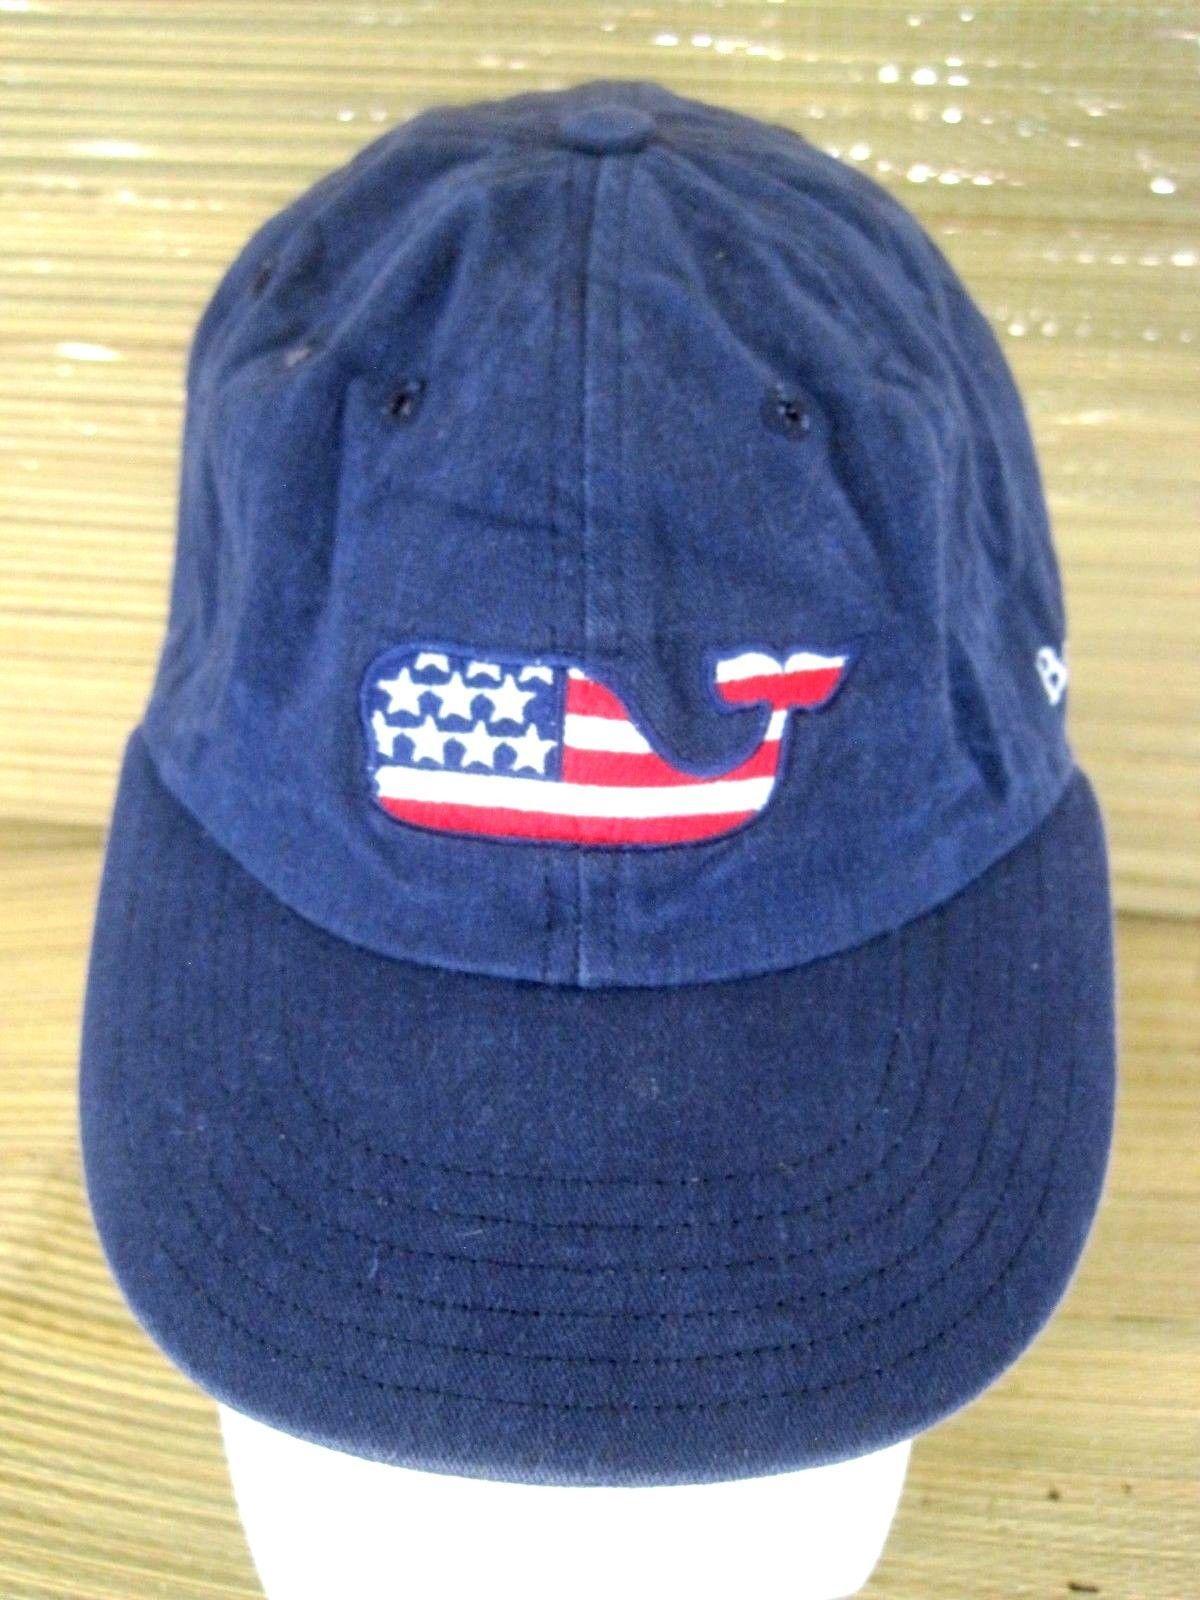 a72e50a079601 VINEYARD VINES Ball Cap unisex adult USA and 37 similar items